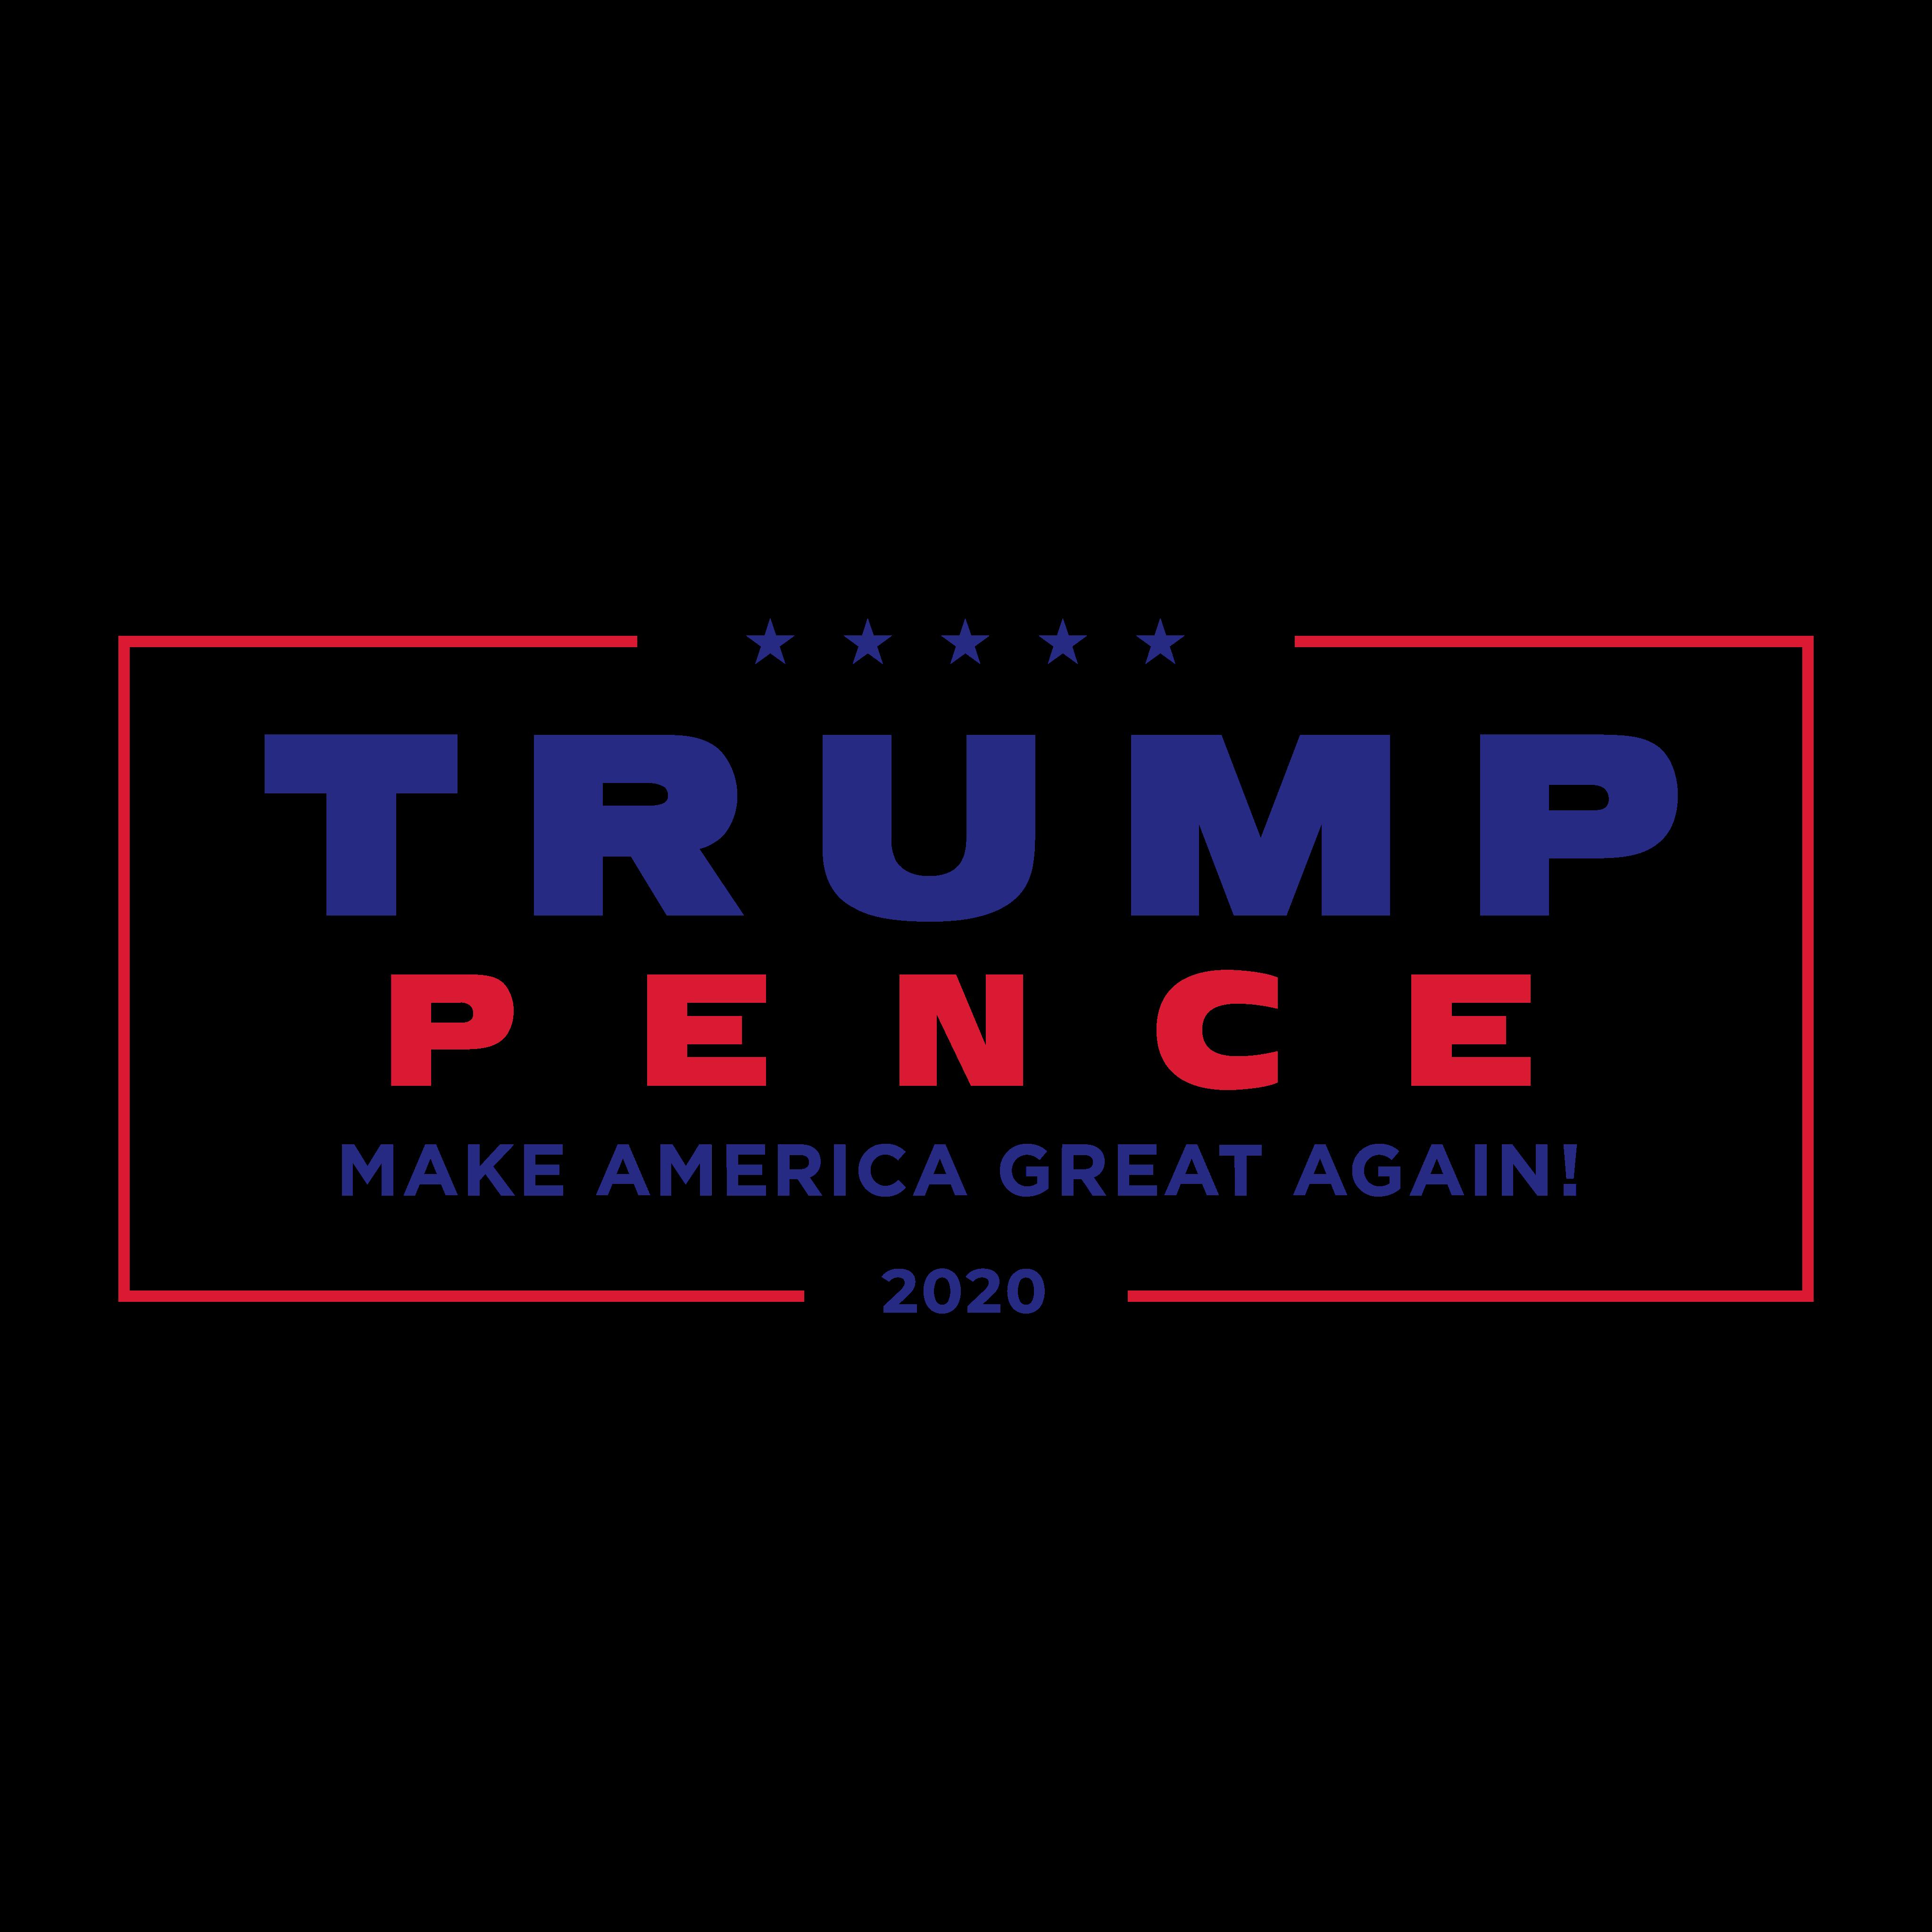 trump president 2020 logo 0 - Trump President 2020 Logo